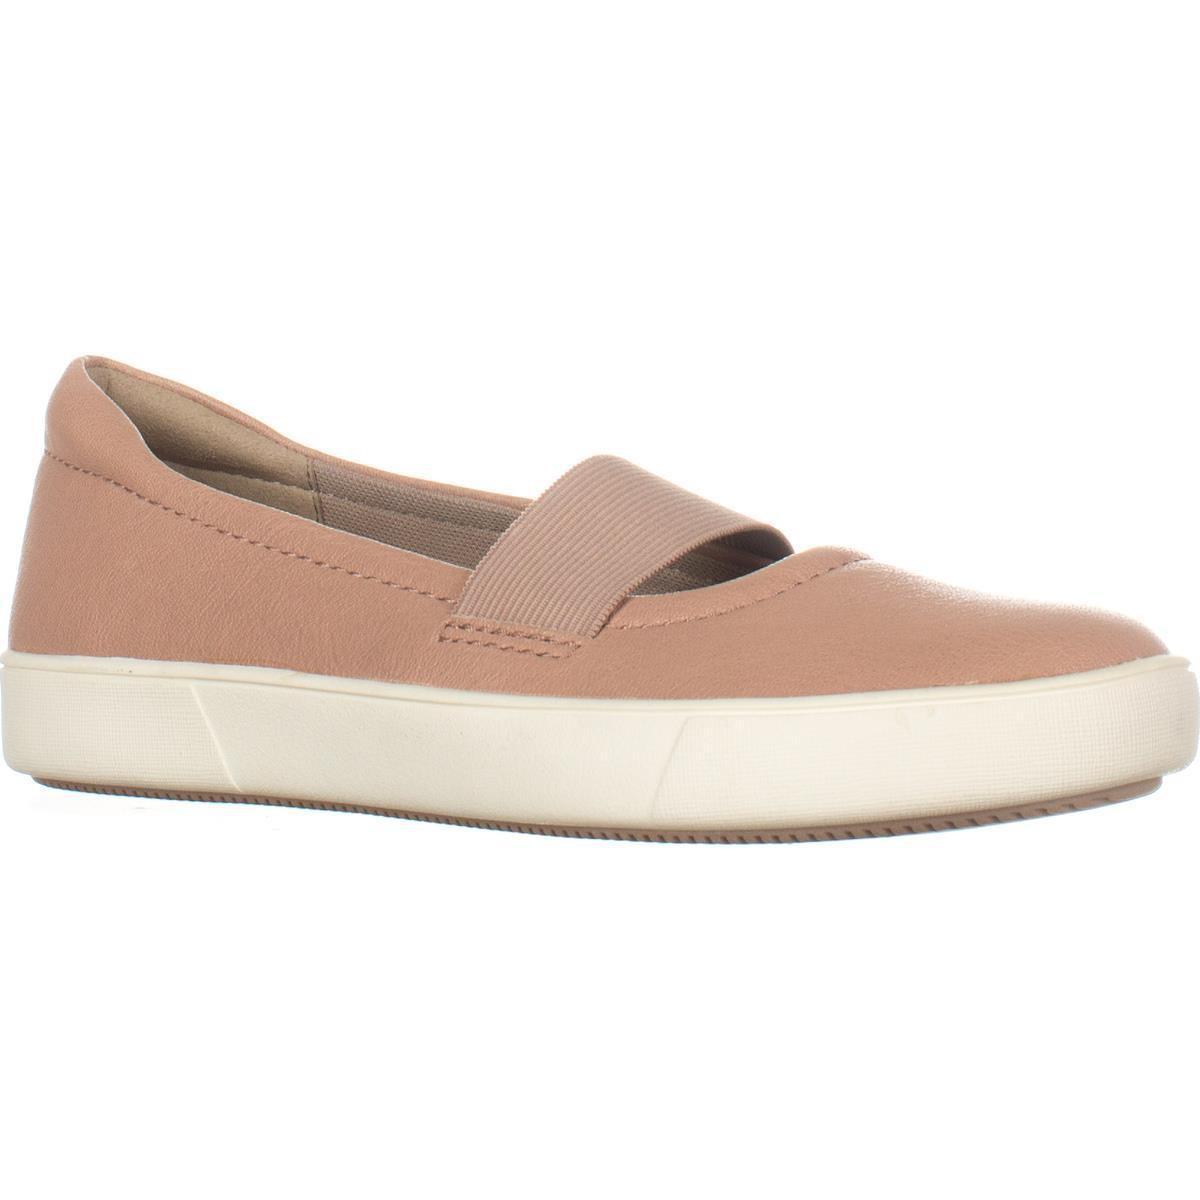 Naturalizer N Comfort Sandals Black